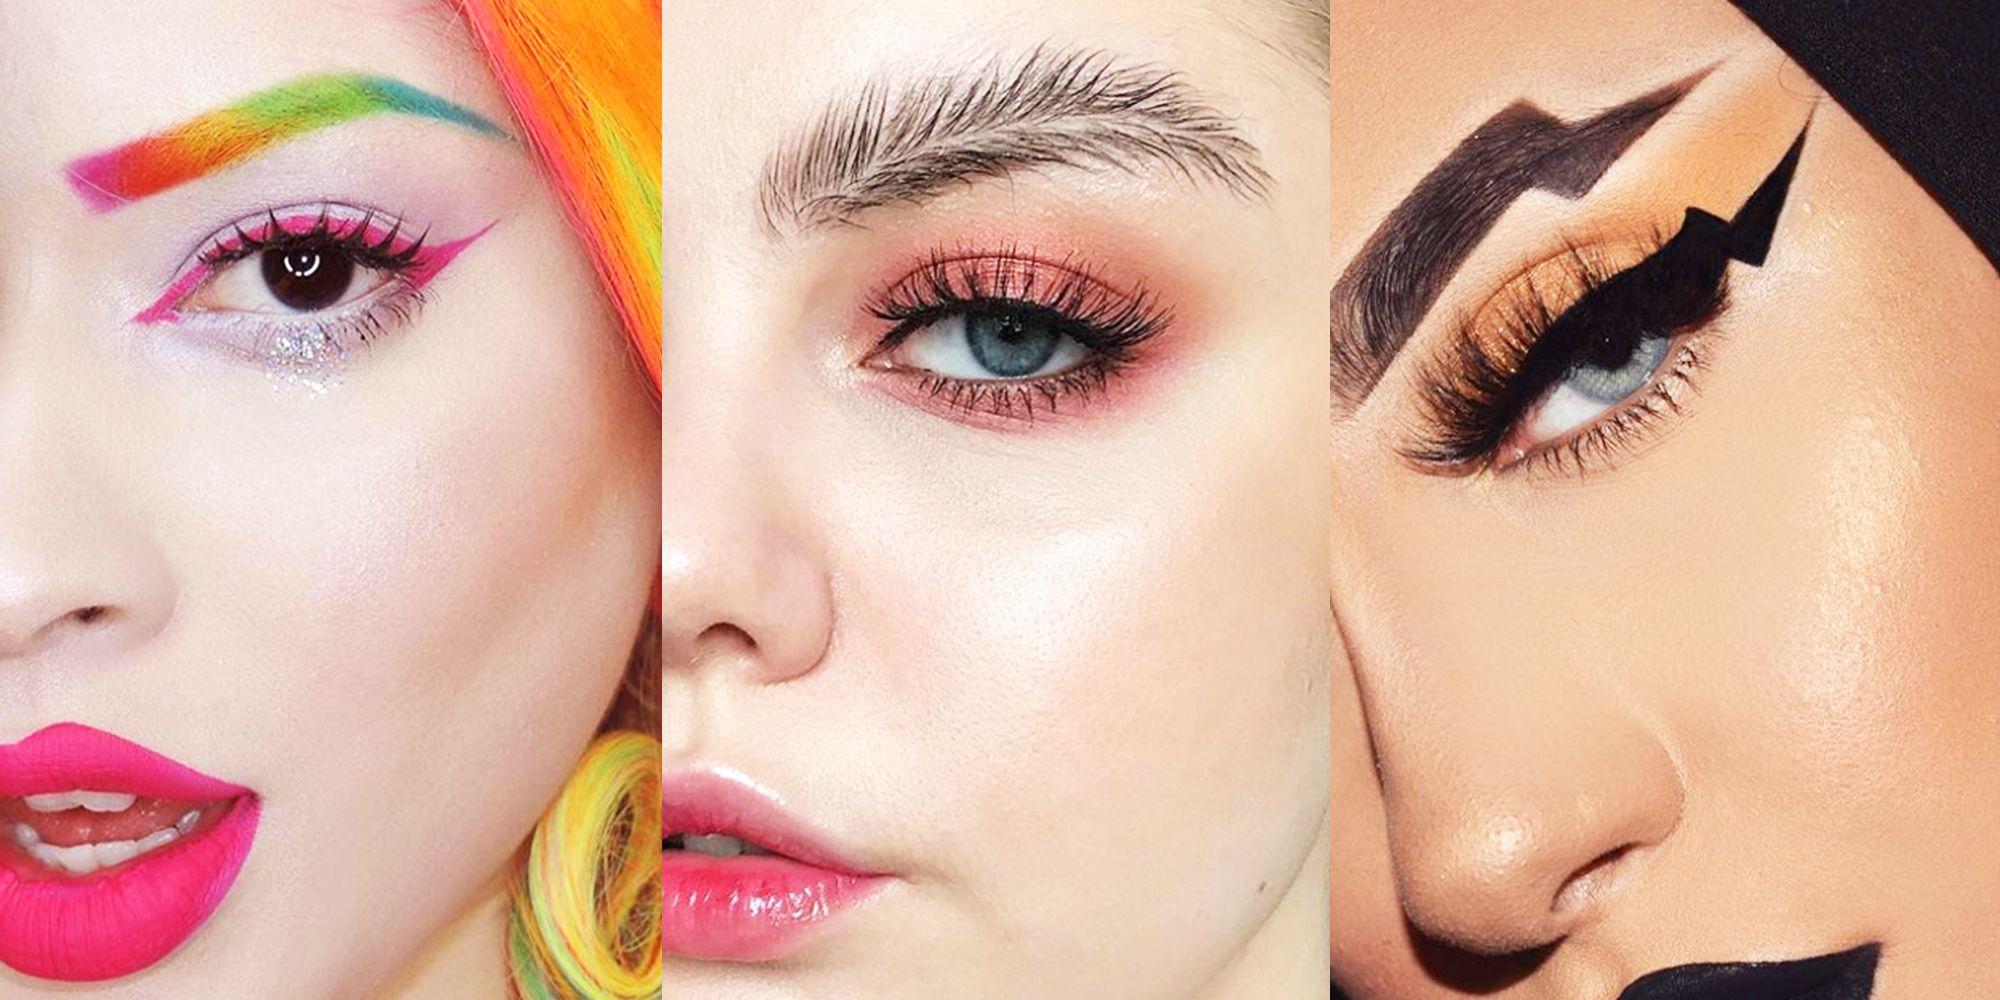 The Strangest Eyebrow Trends Of 2017